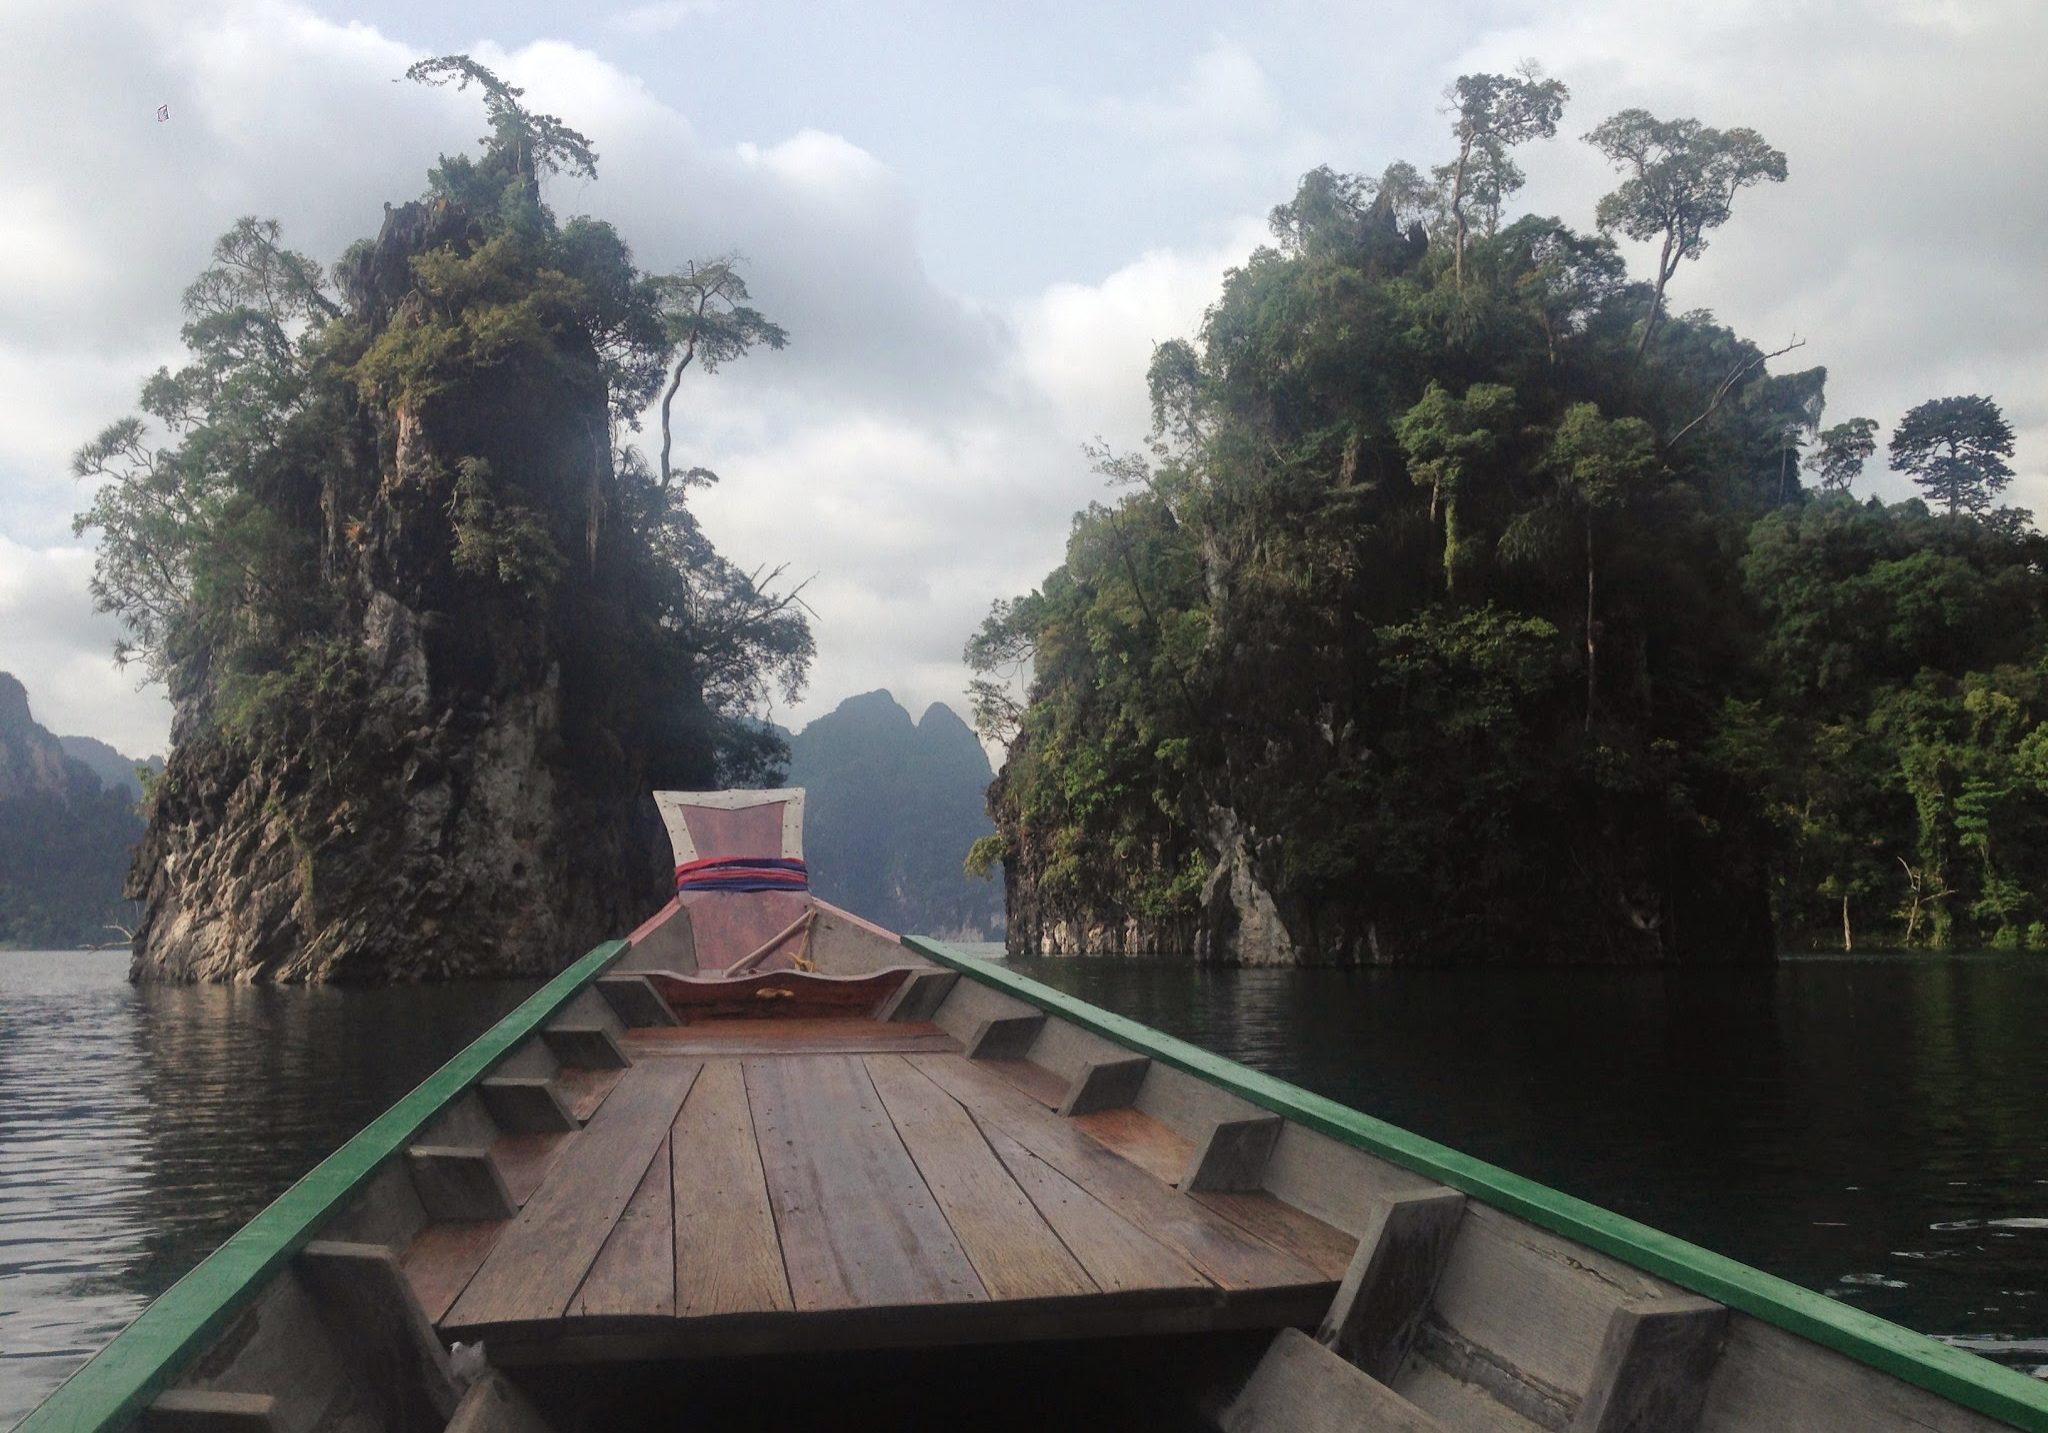 Cheow Lan Lake, thailand, kok sok national park, lake, long tail boat, travels, travelling, backpacking, sightseeing,